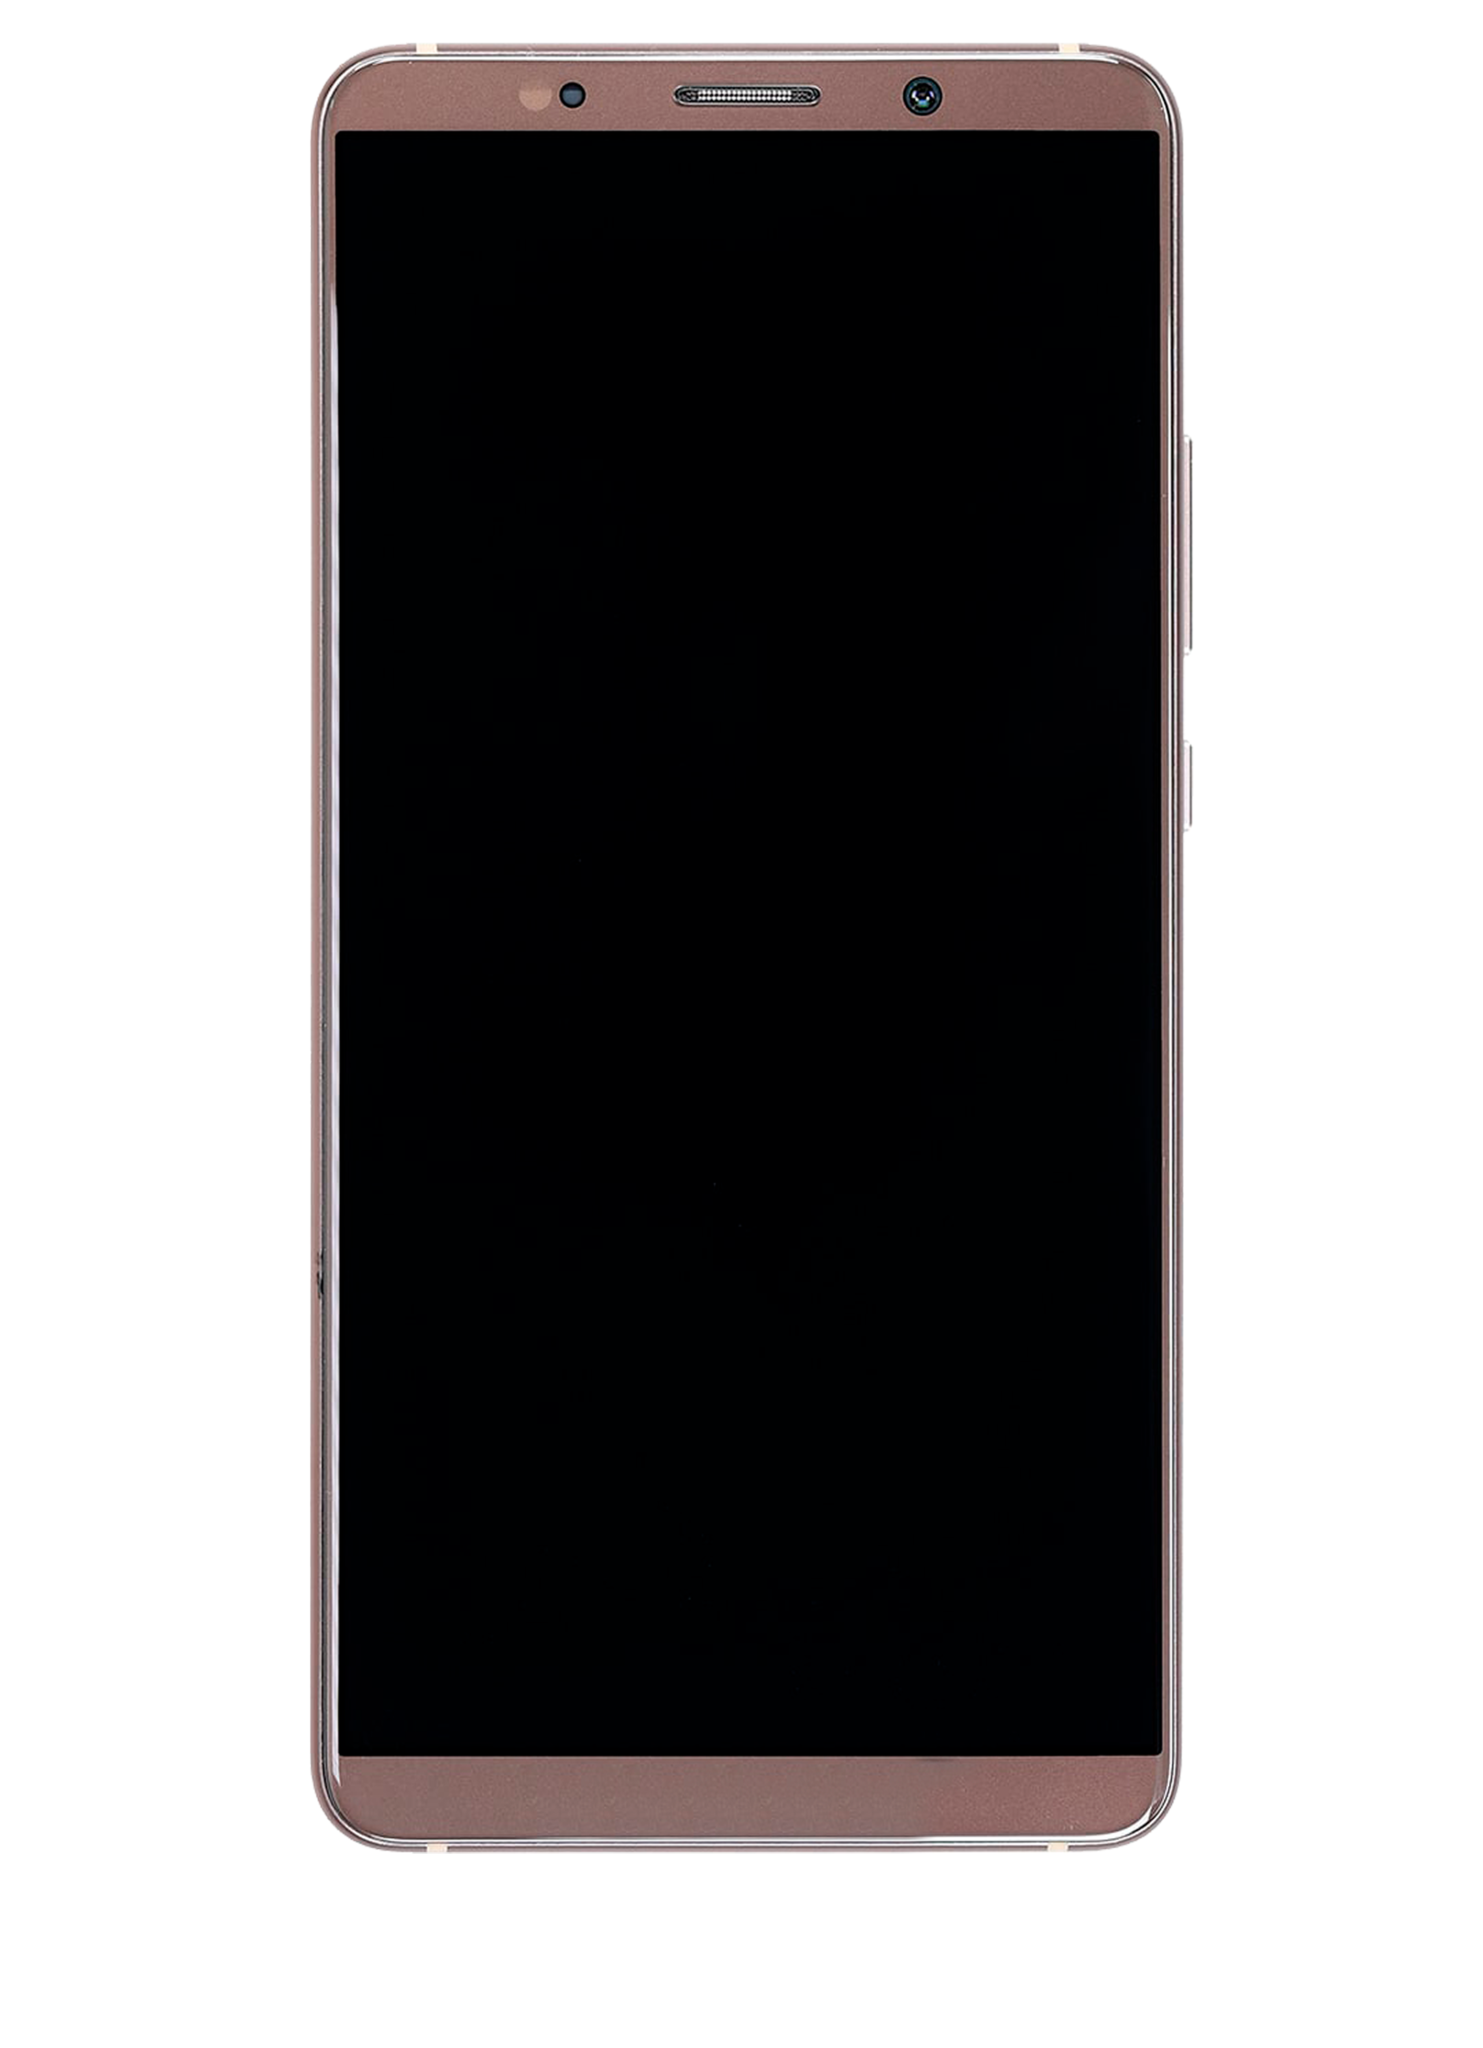 Huawei Mate 10 Pro BLA-L09 Display Module + Frame Brown